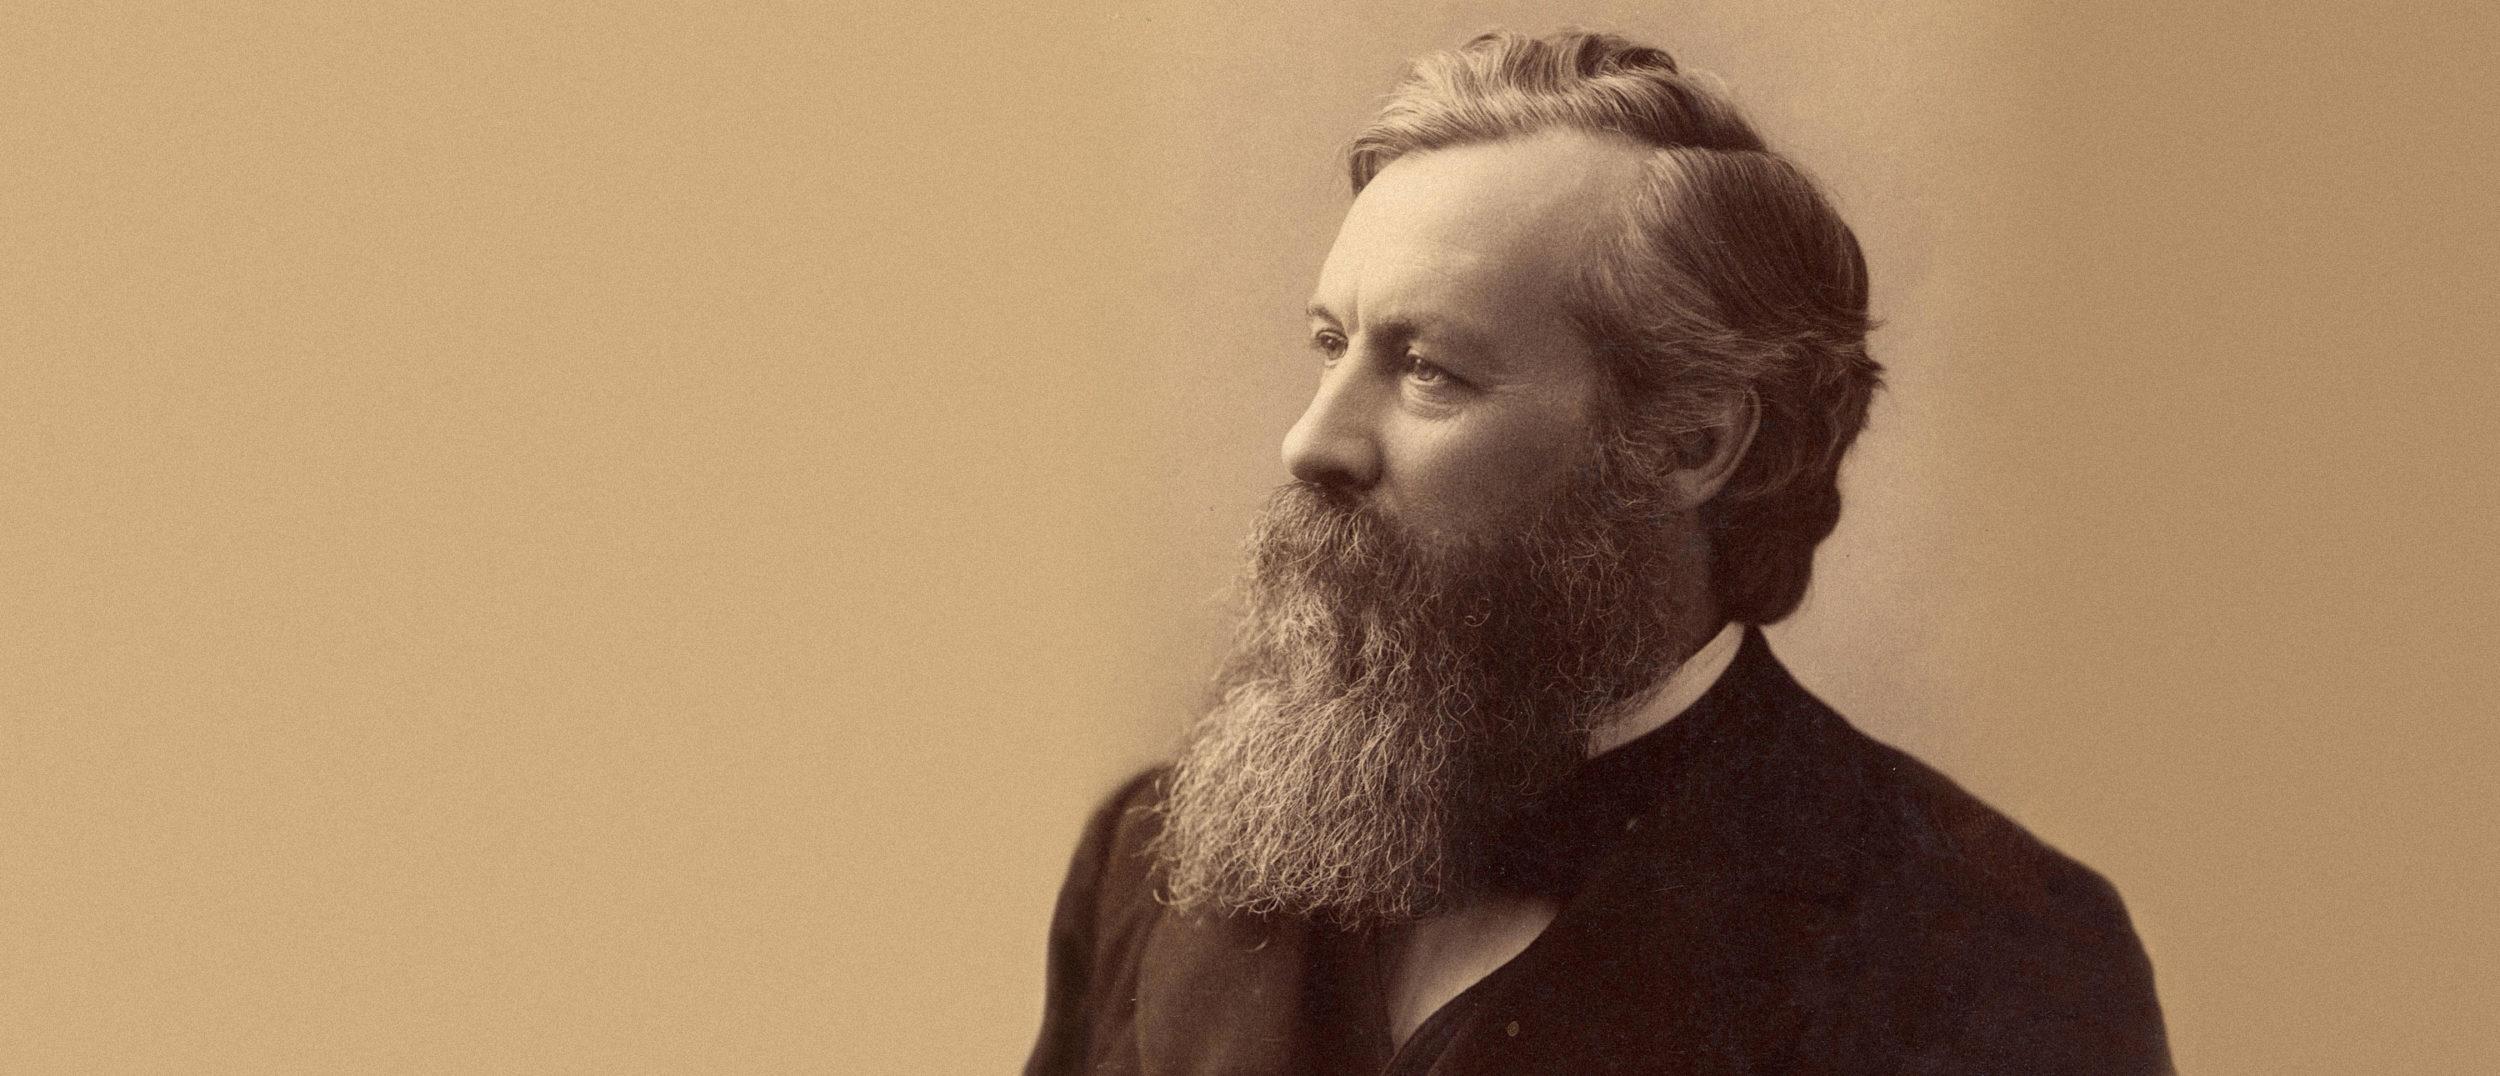 Alexander Winchell